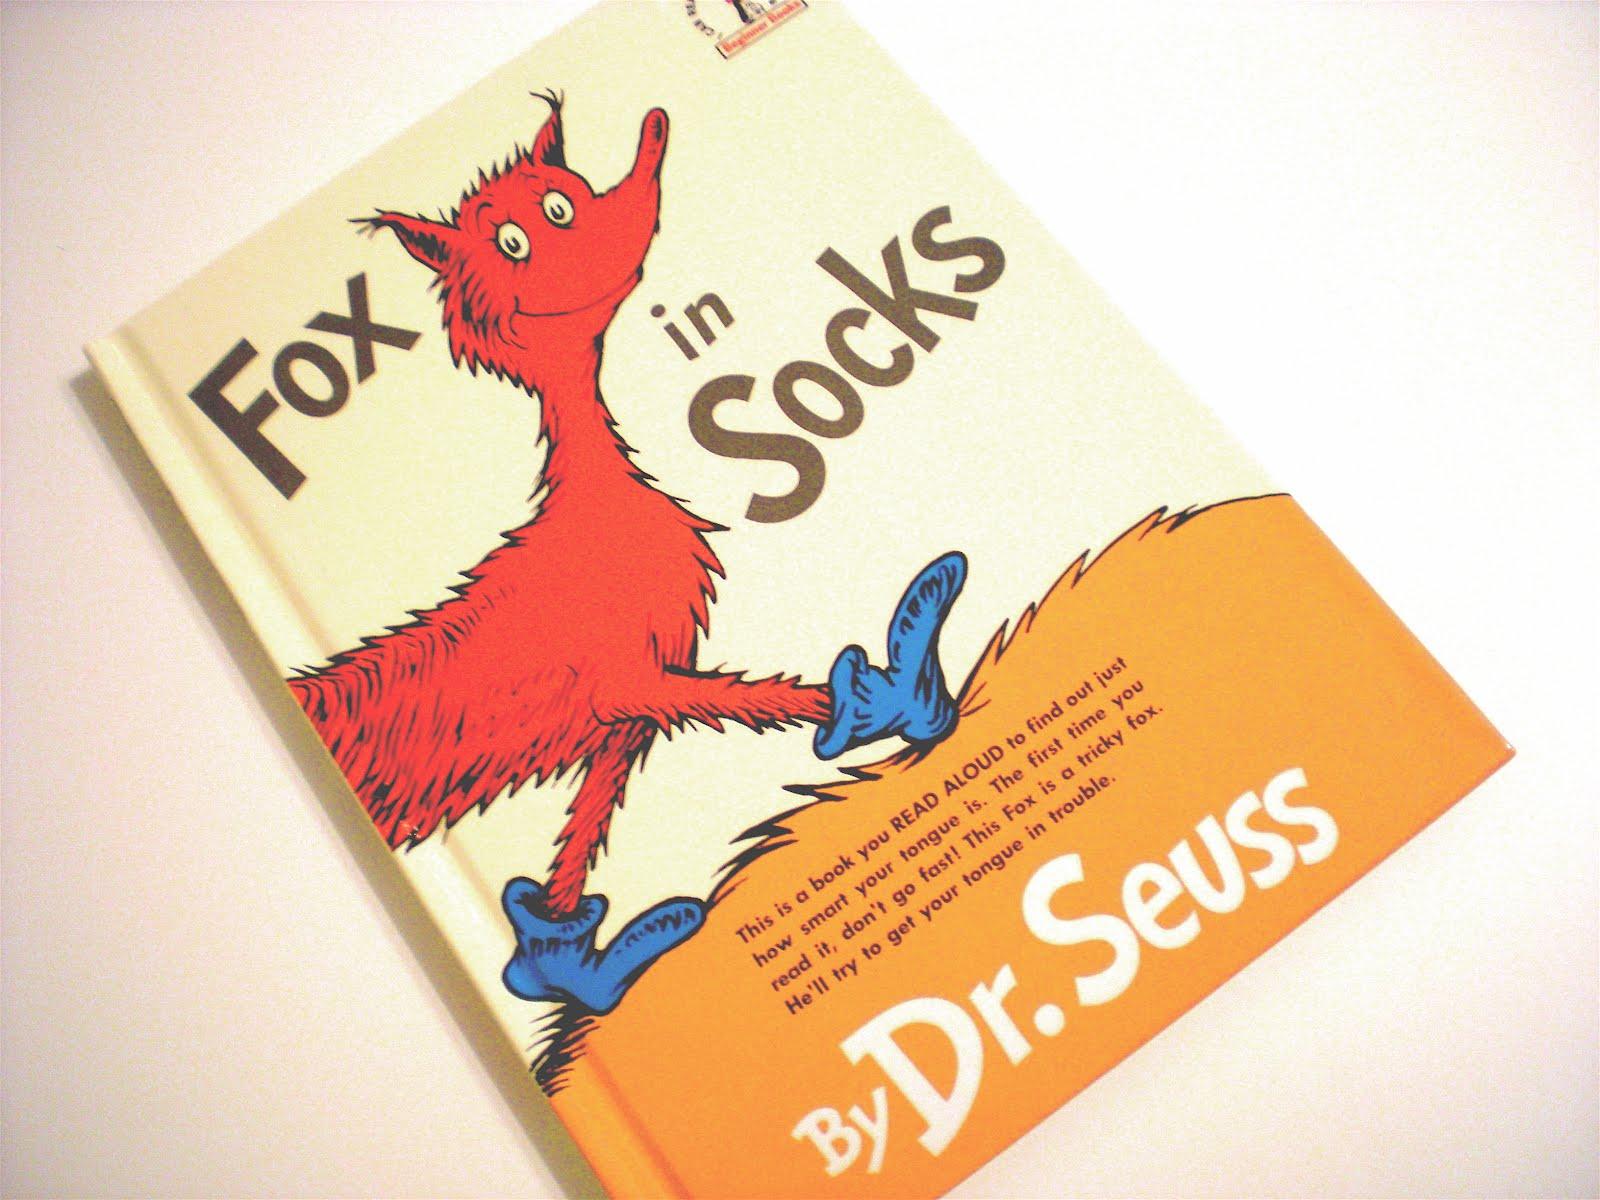 Dr seuss fox in socks pictures Buttercream Wedding Cake Designs LoveToKnow